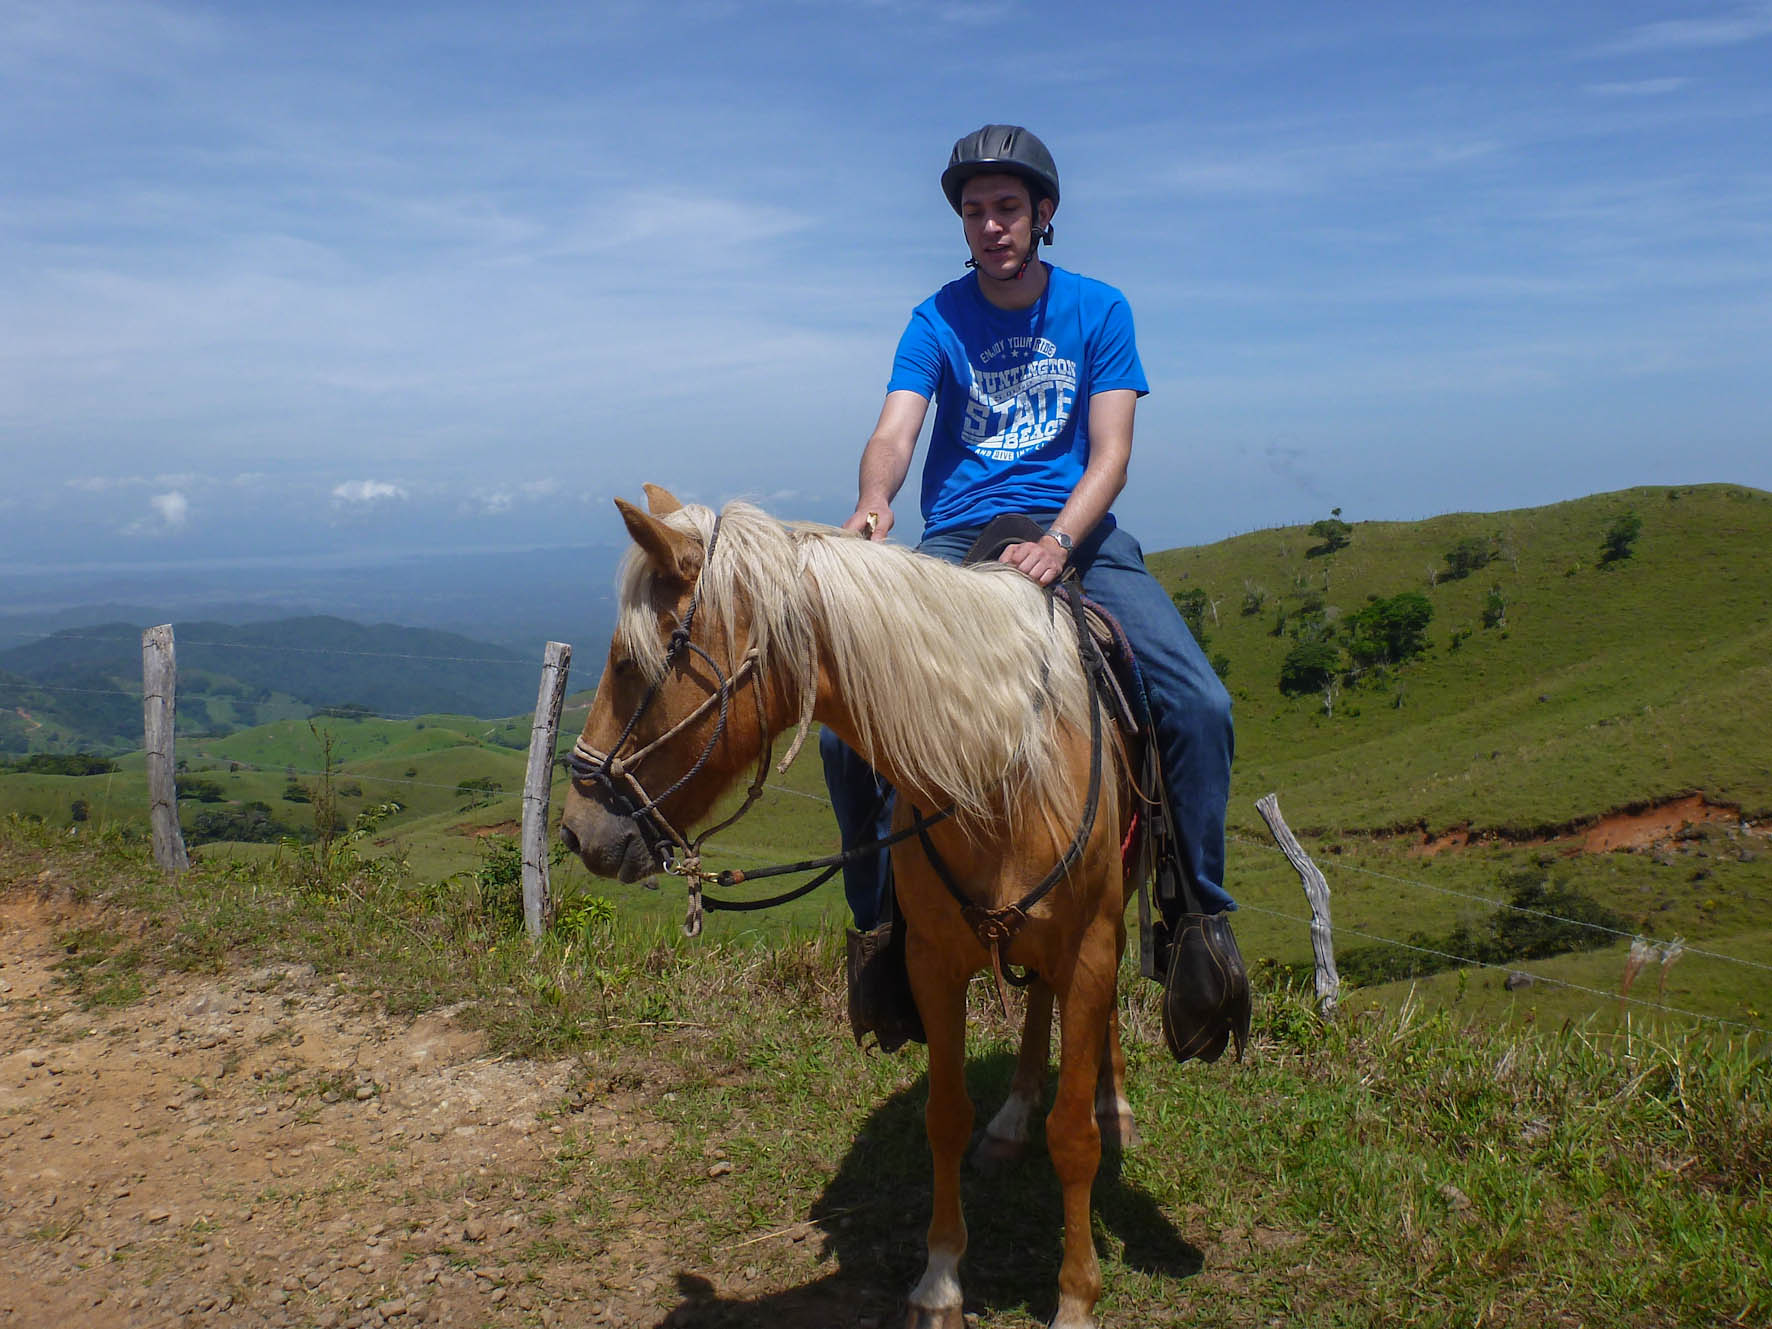 Tobias auf dem Pferd